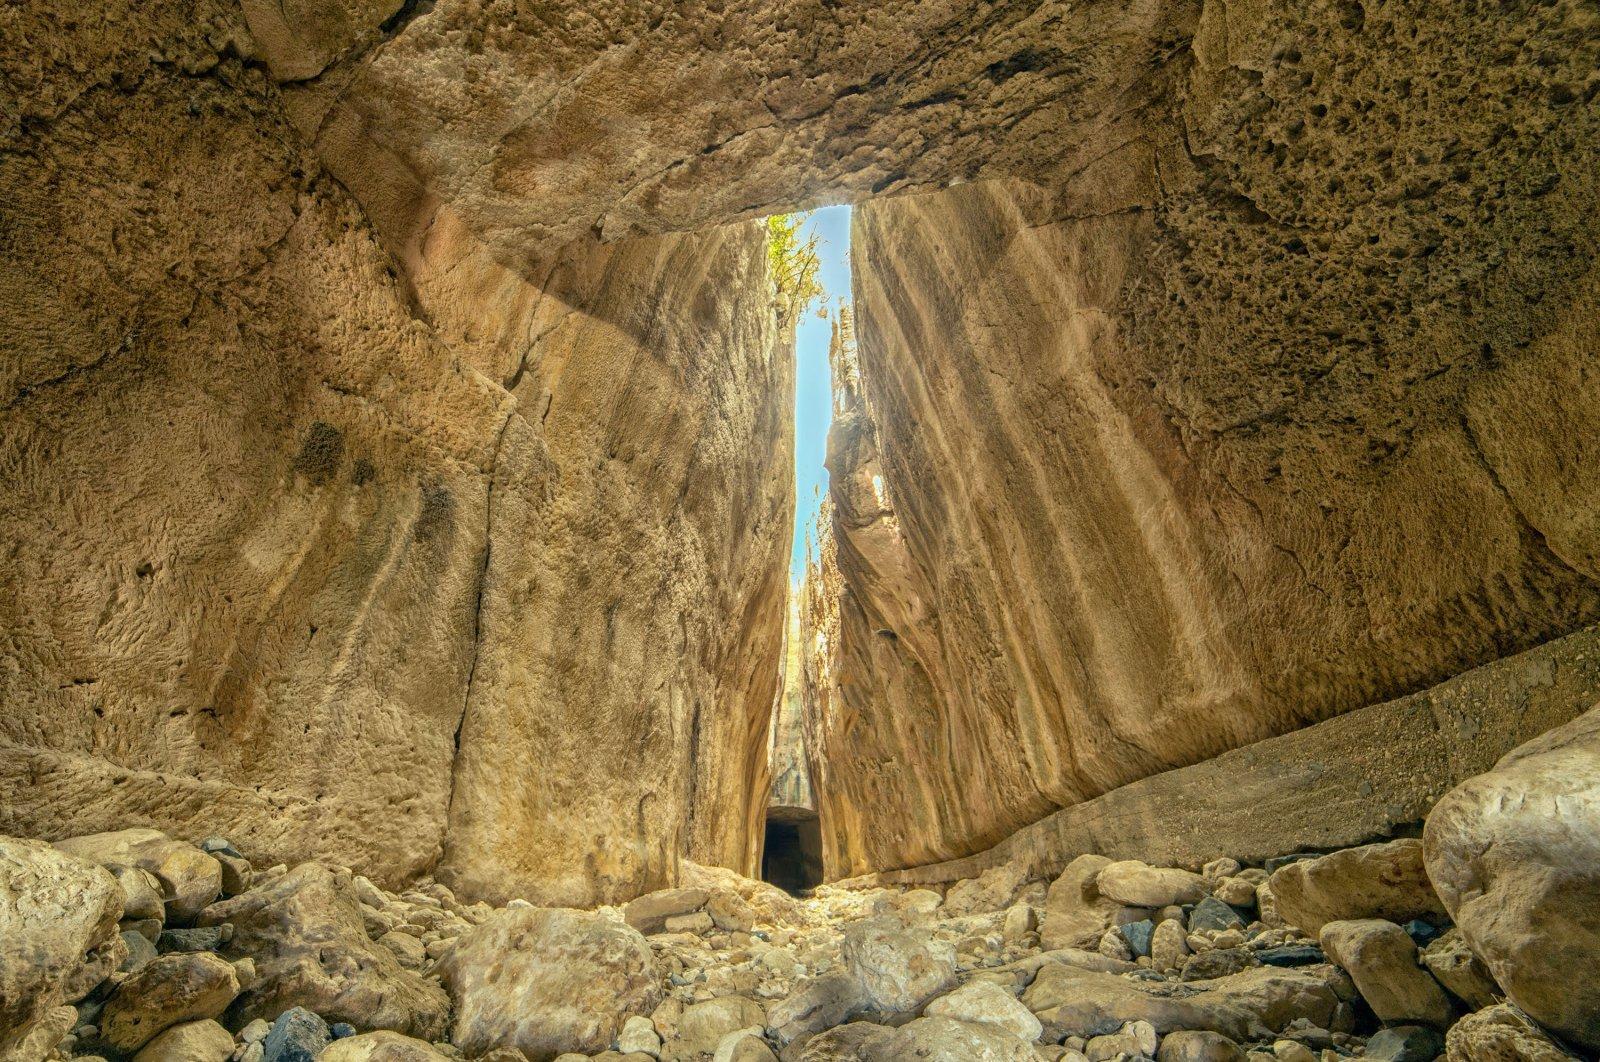 The ancient Roman Titus Tunnel, inthe Samandağ district of Hatay,Turkey. (Shutterstock Photo)